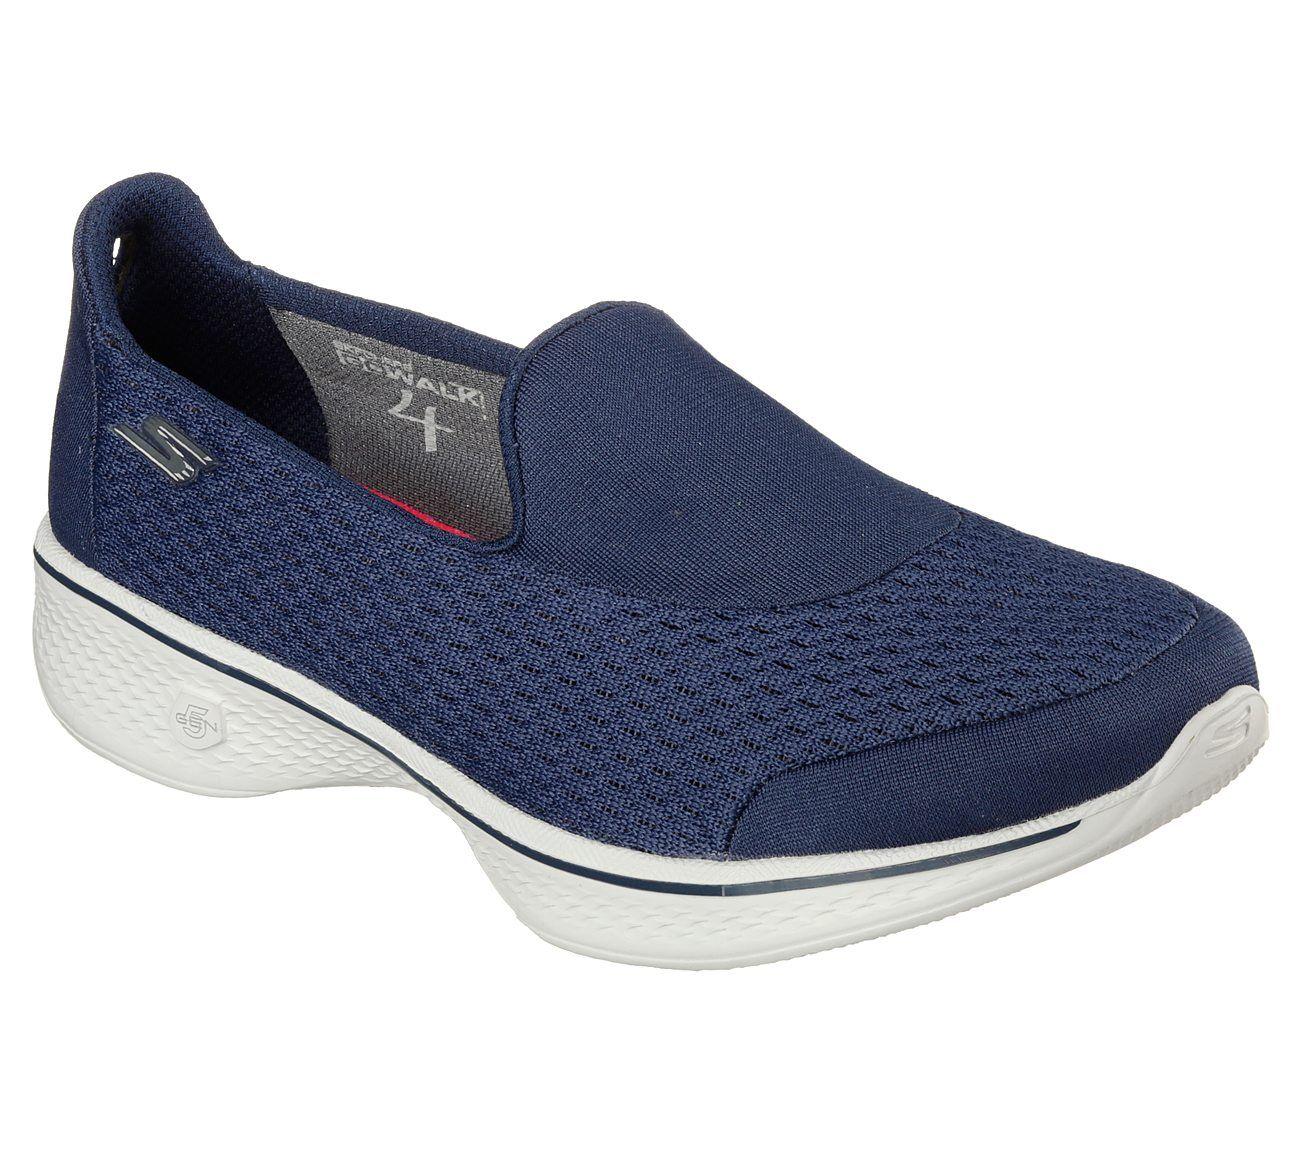 SKECHERS, GO WALK 5 Walkingschuhe, blau